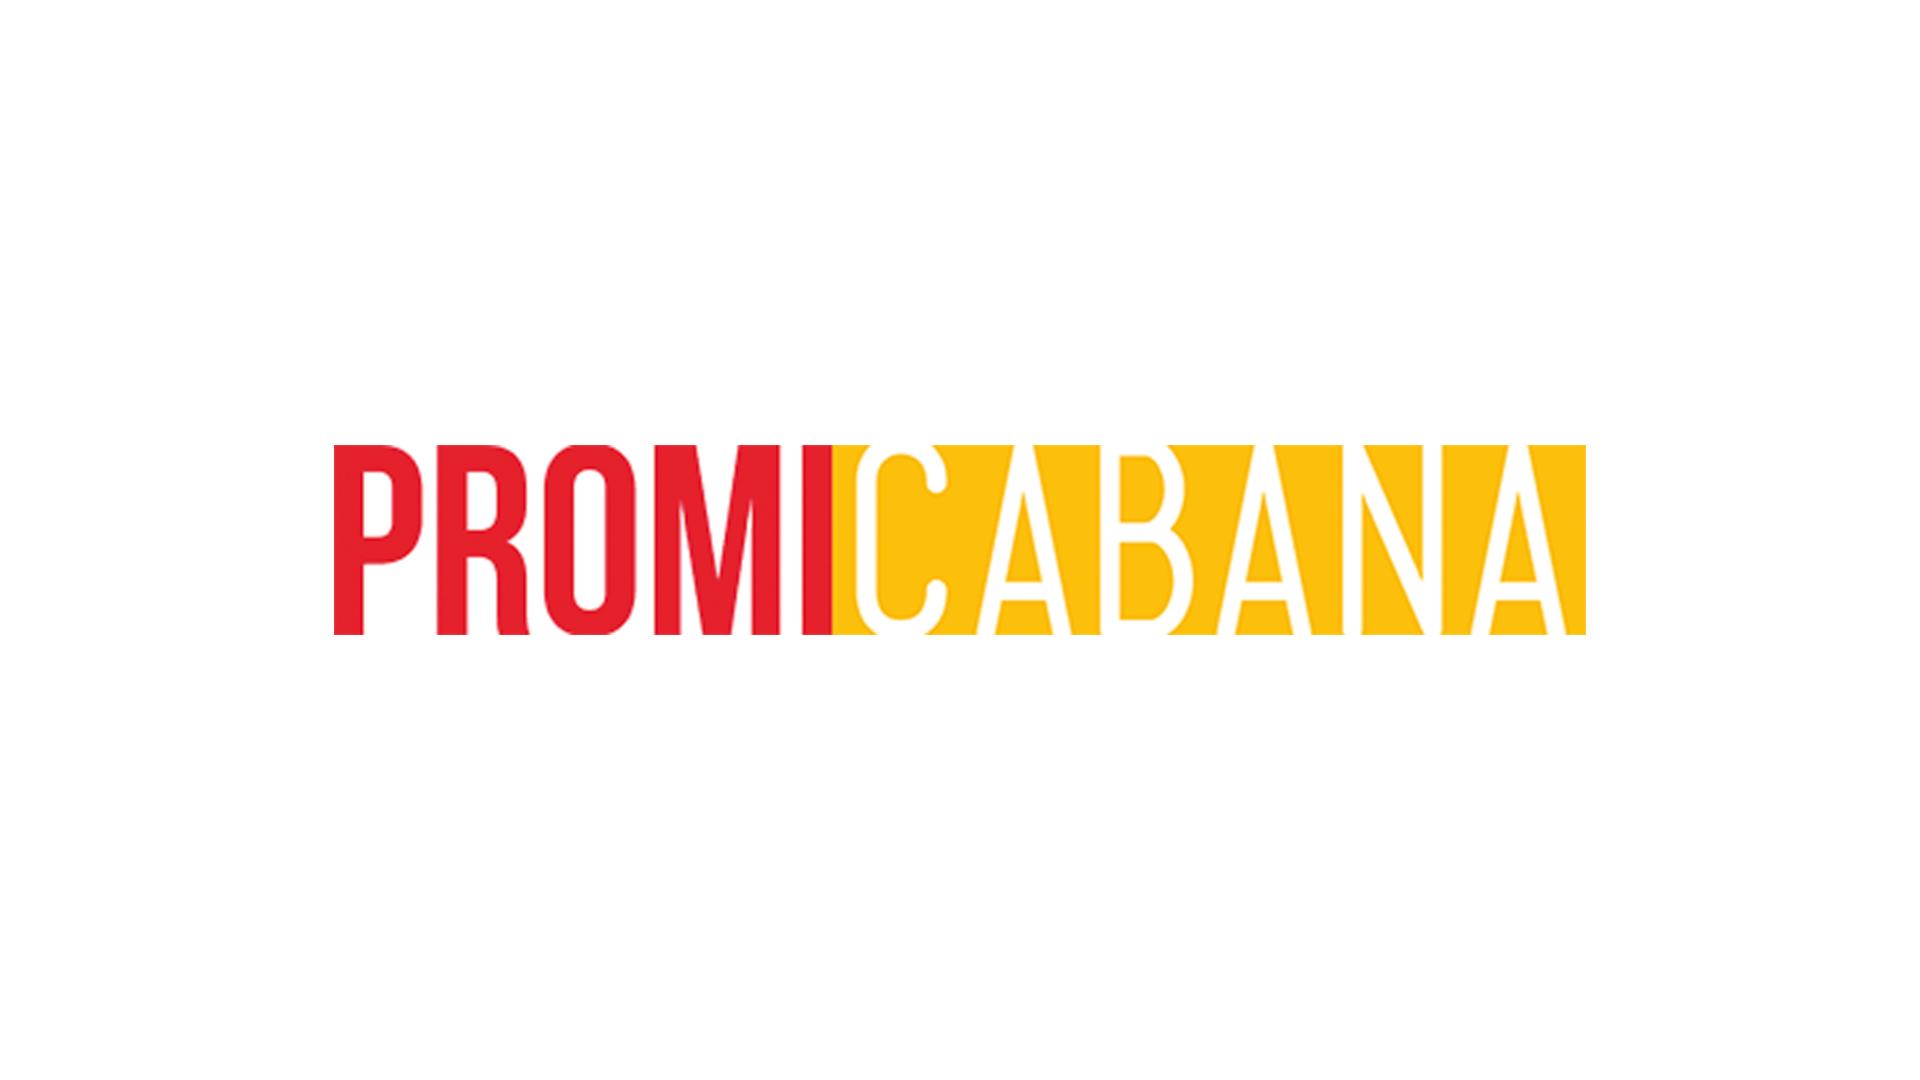 Miley-Cyrus-The-Conversation